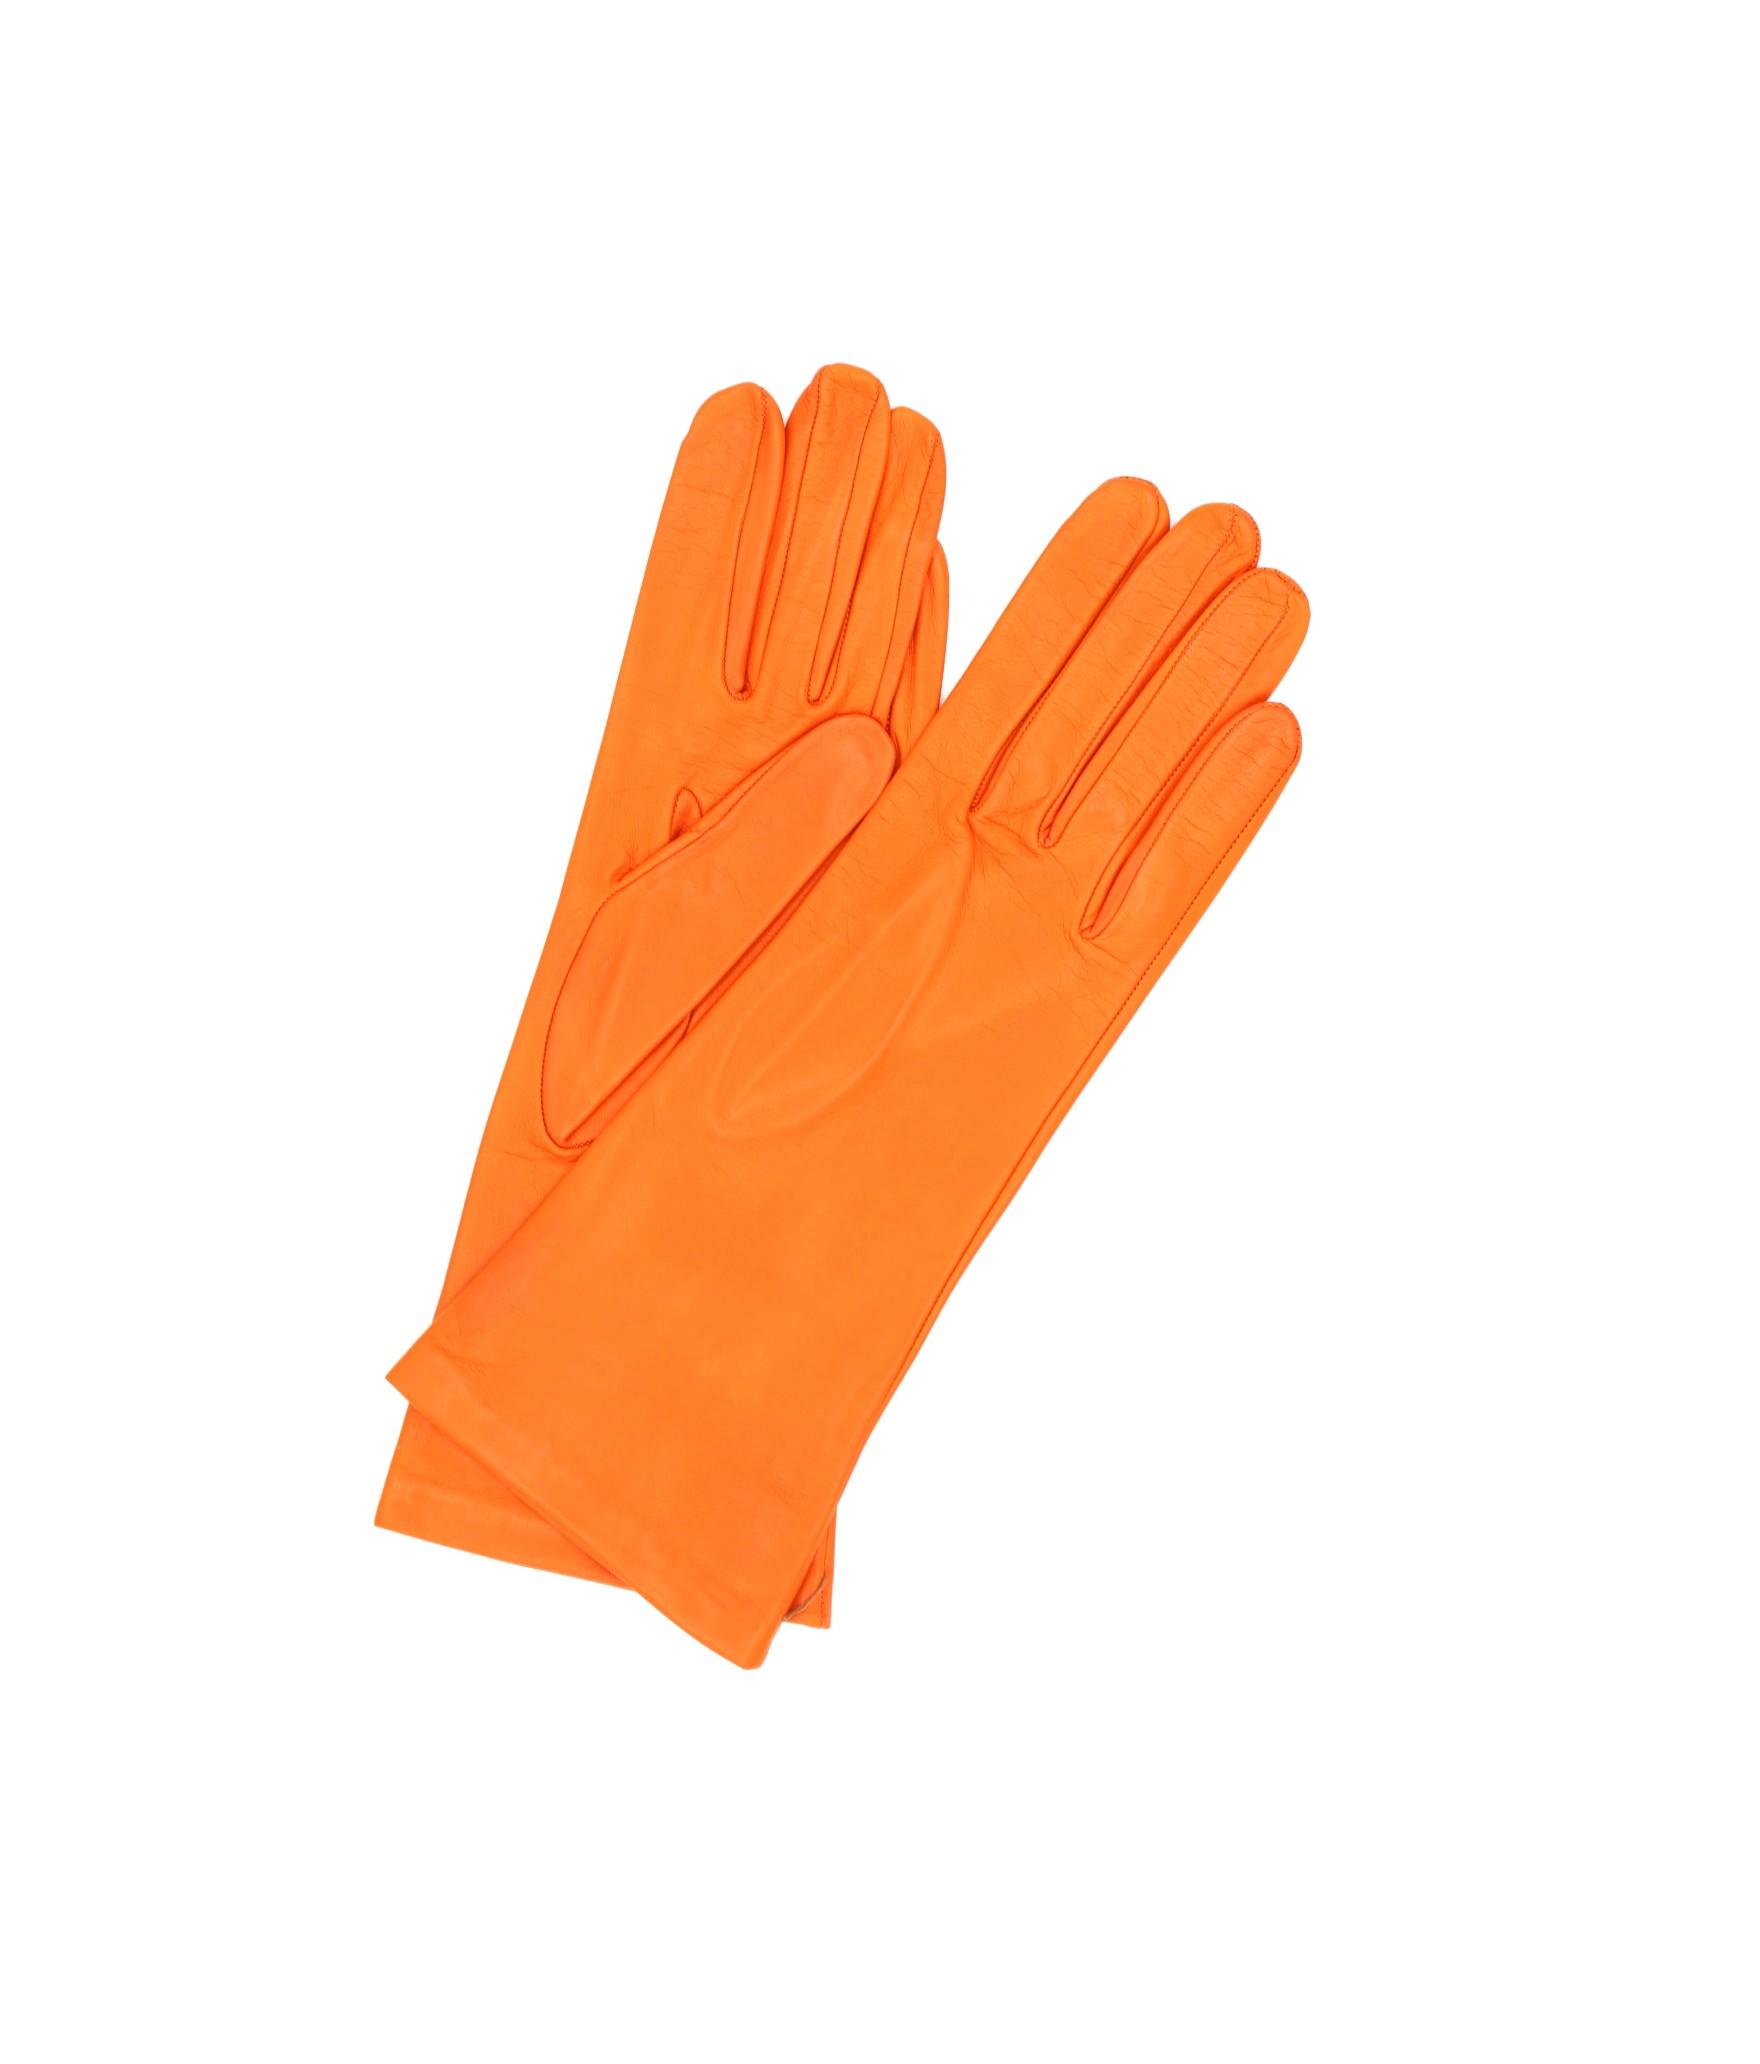 Nappa leather gloves 4bt Silk lined Orange Sermoneta Gloves